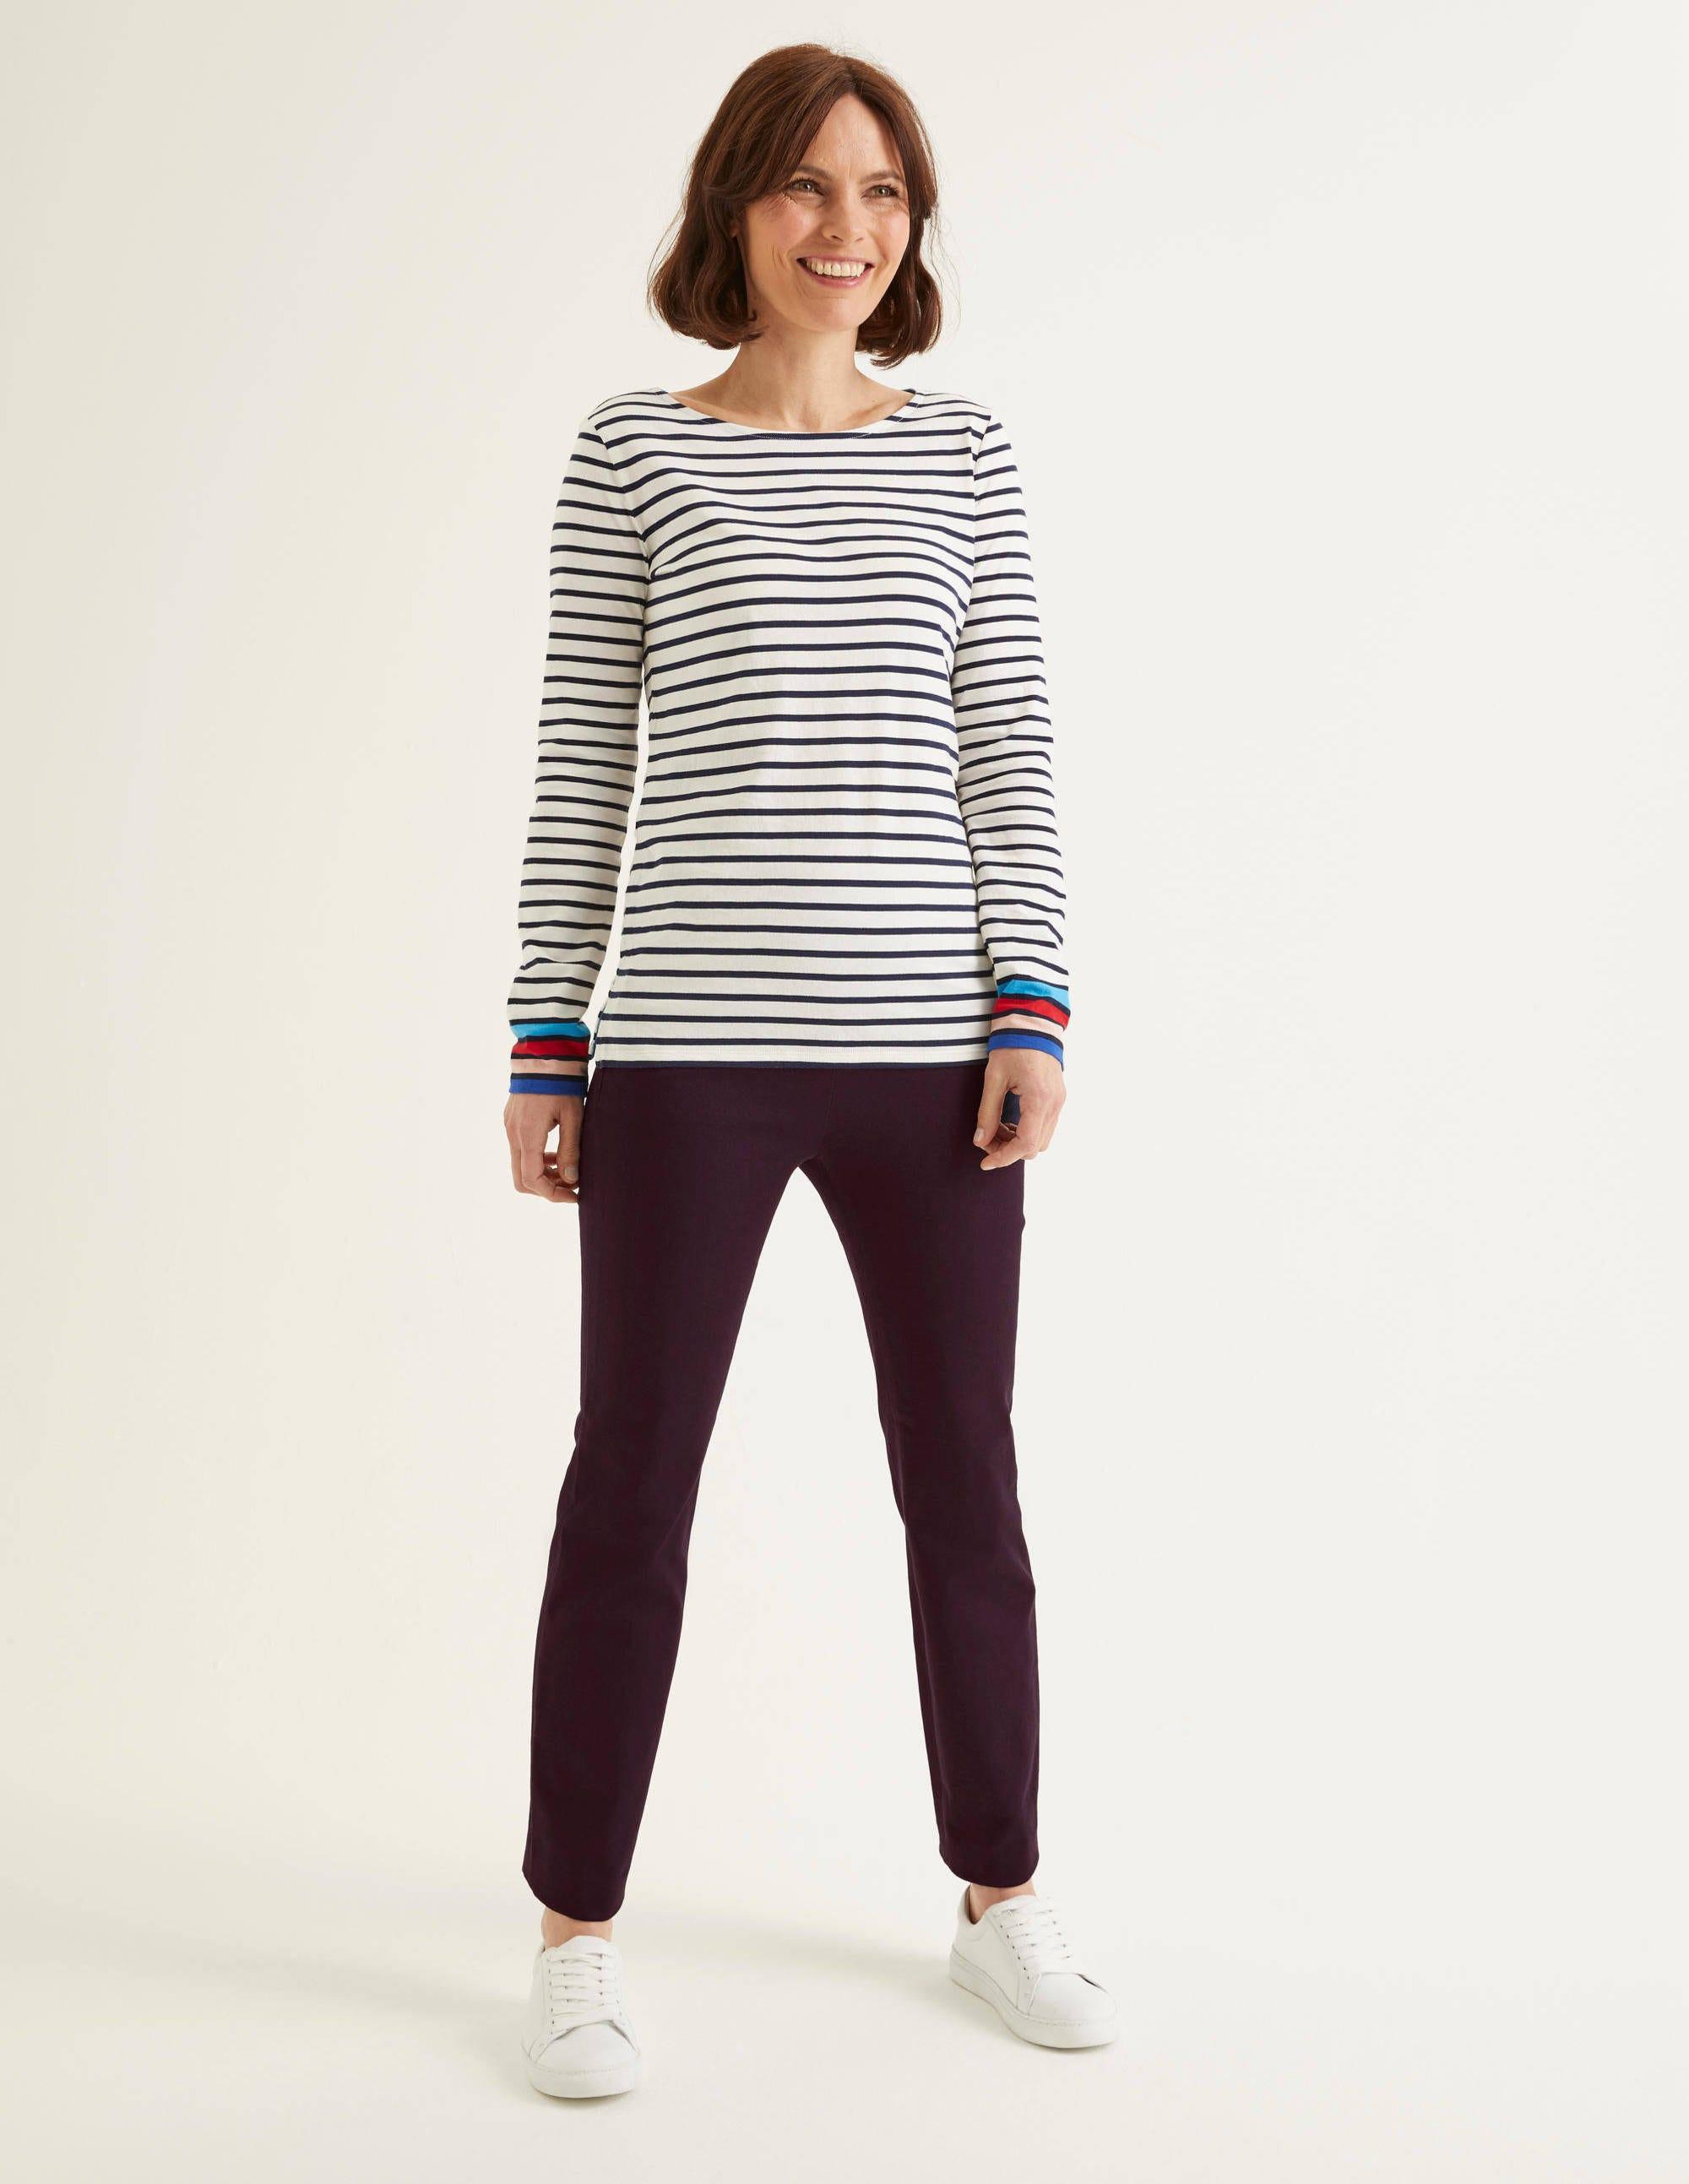 New Ladies Womens Girls Black/& Navy Stretch School Trousers 5 Styles 6-16